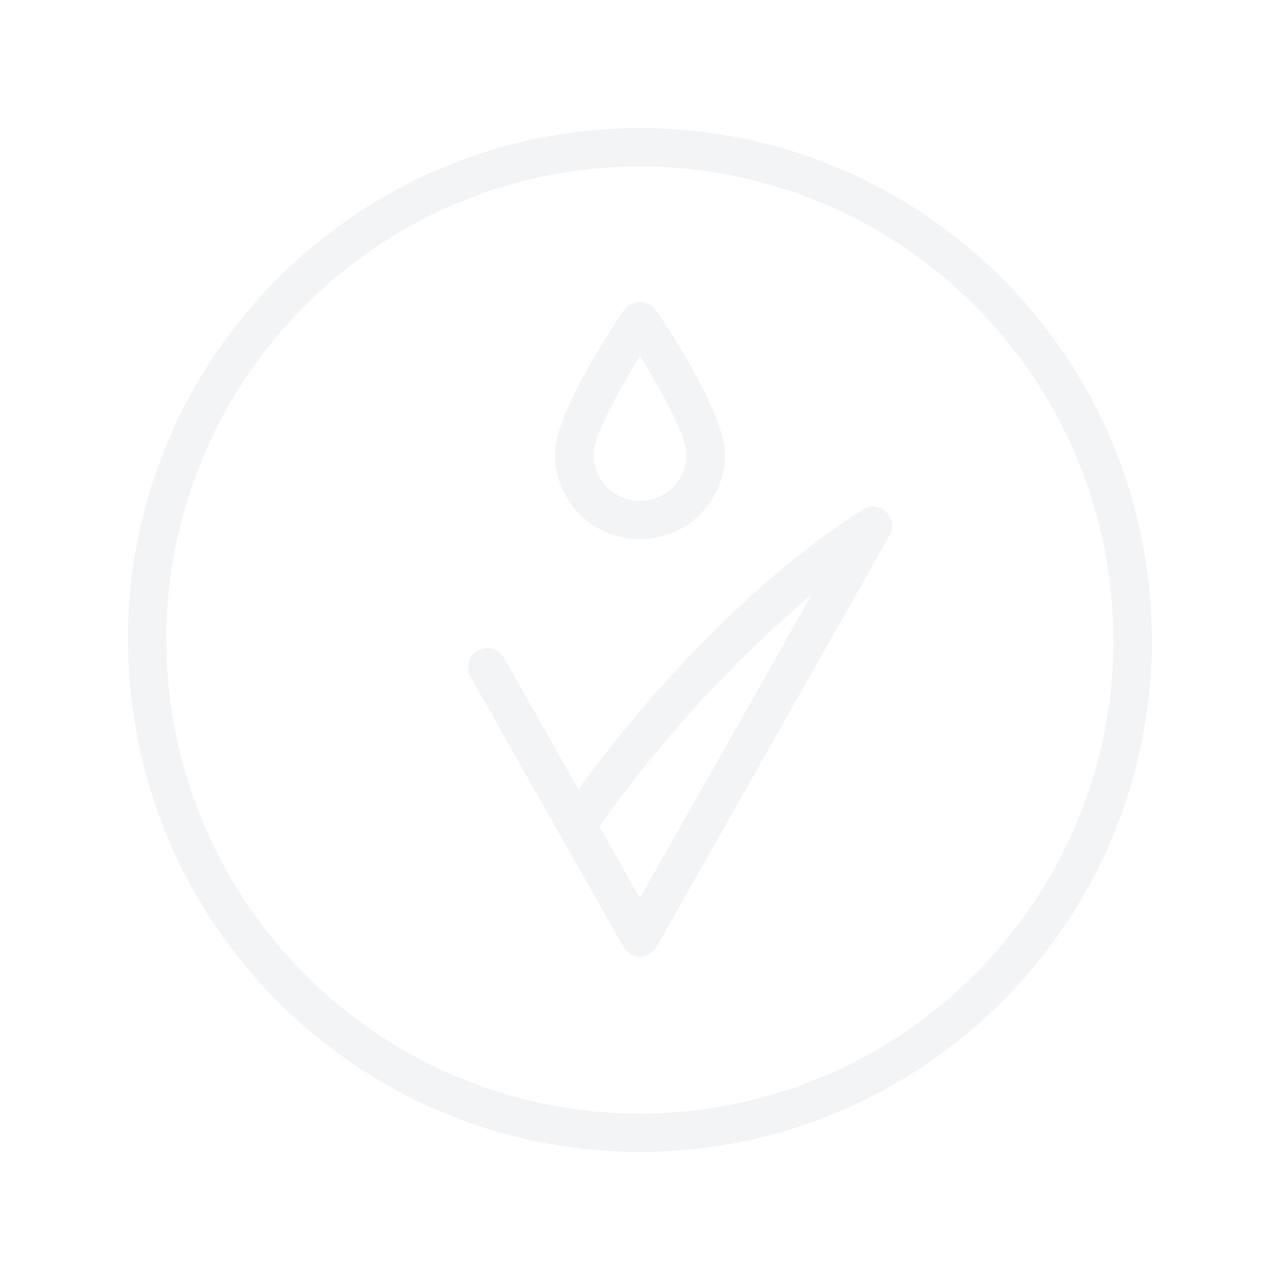 CHLOE 75ml Eau De Parfum Gift Set